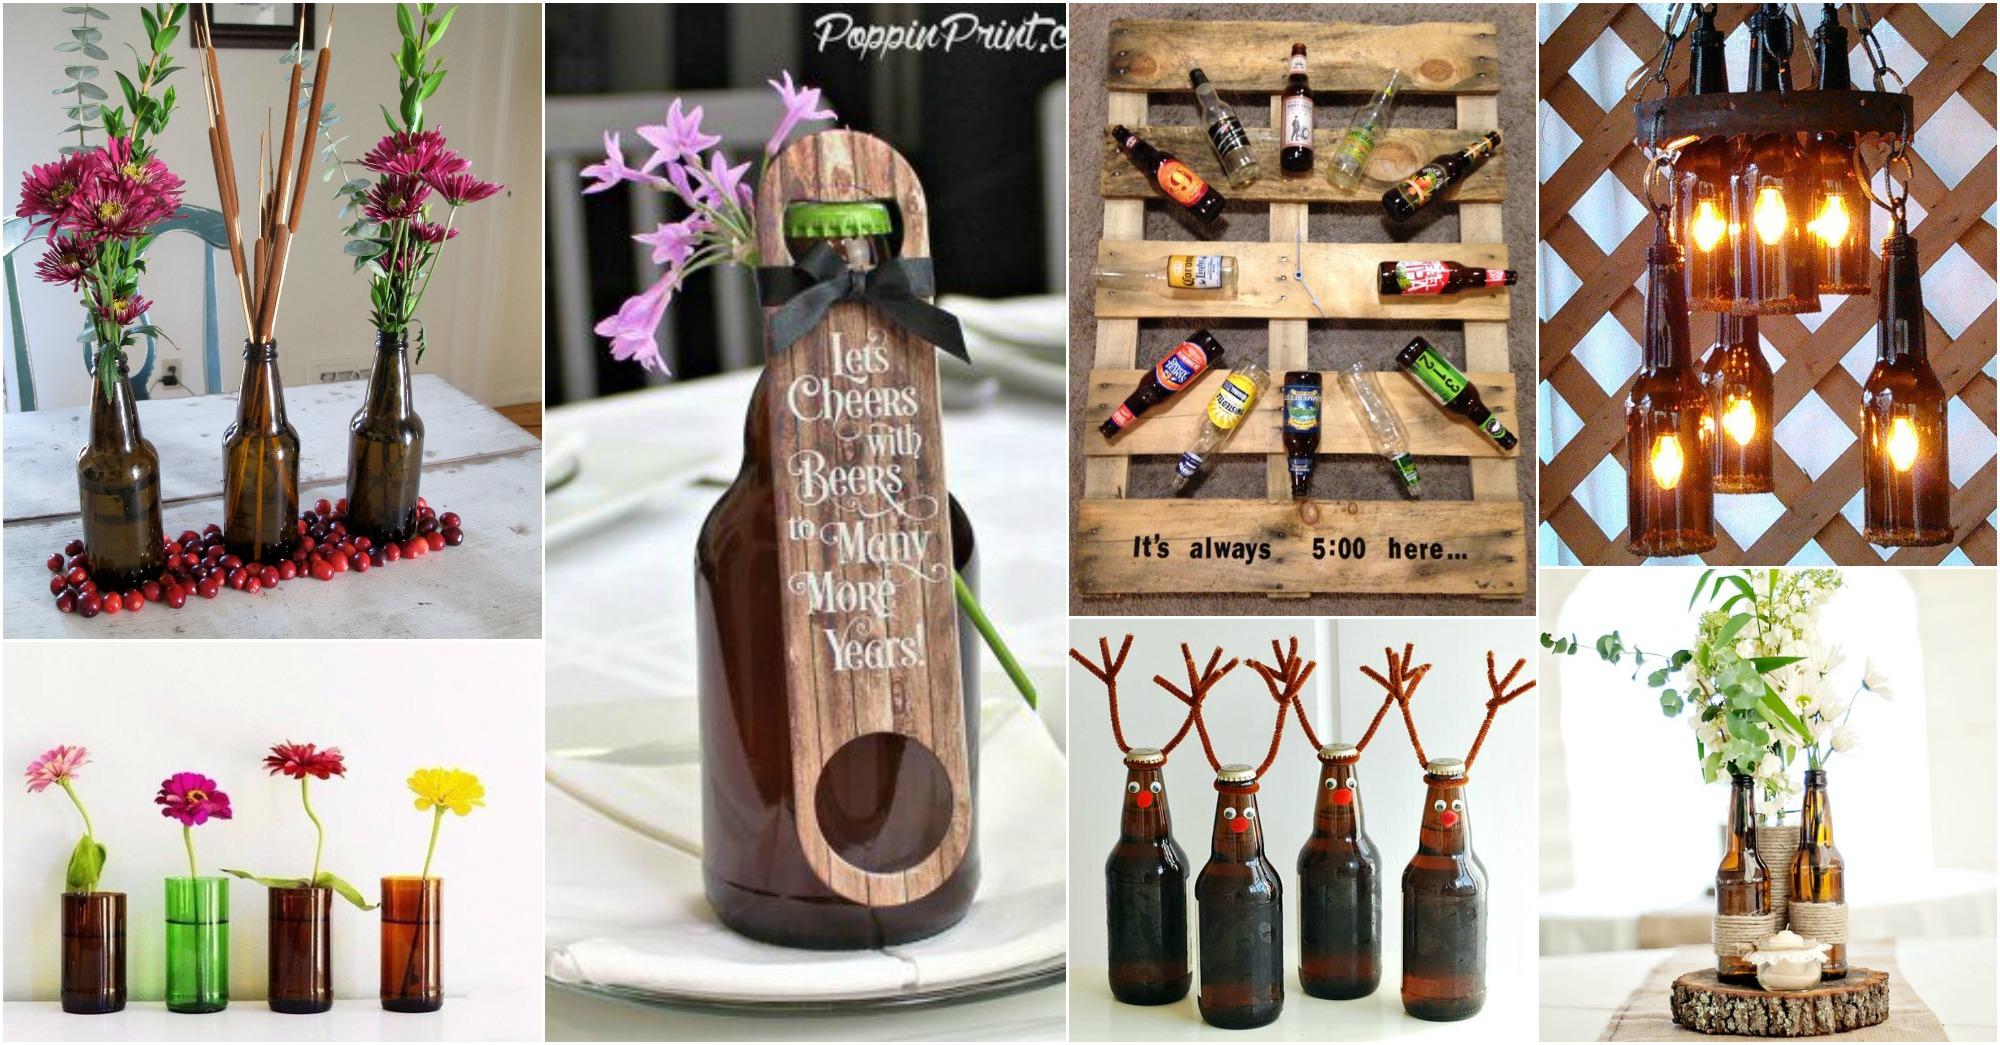 15 Creative Diy Beer Bottles Crafts